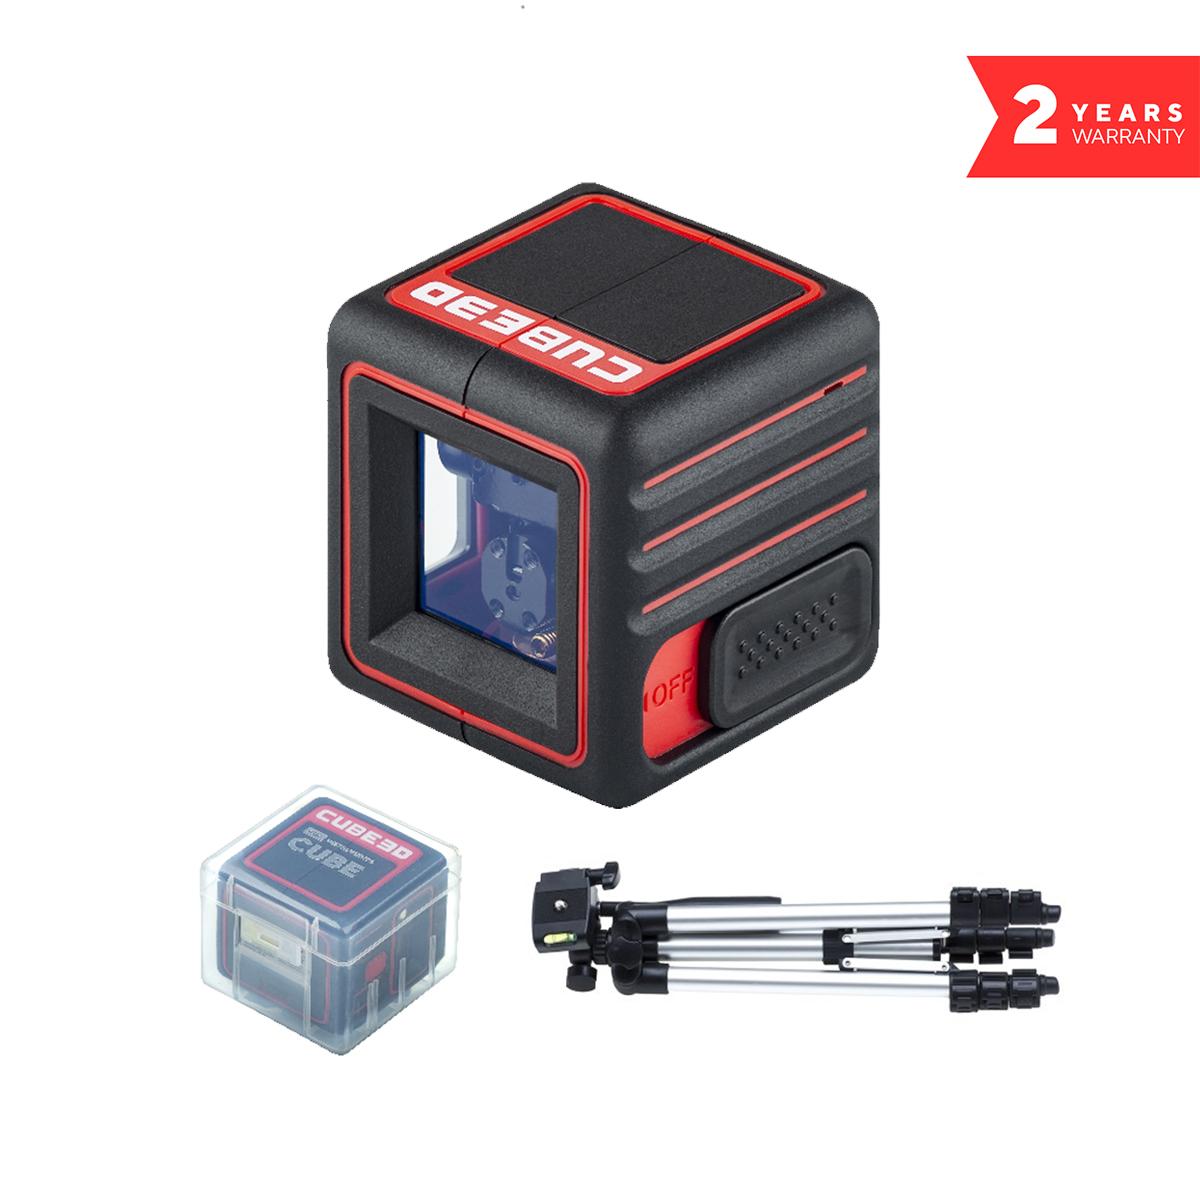 Laser level ADA CUBE 3D PROFESSIONAL EDITION